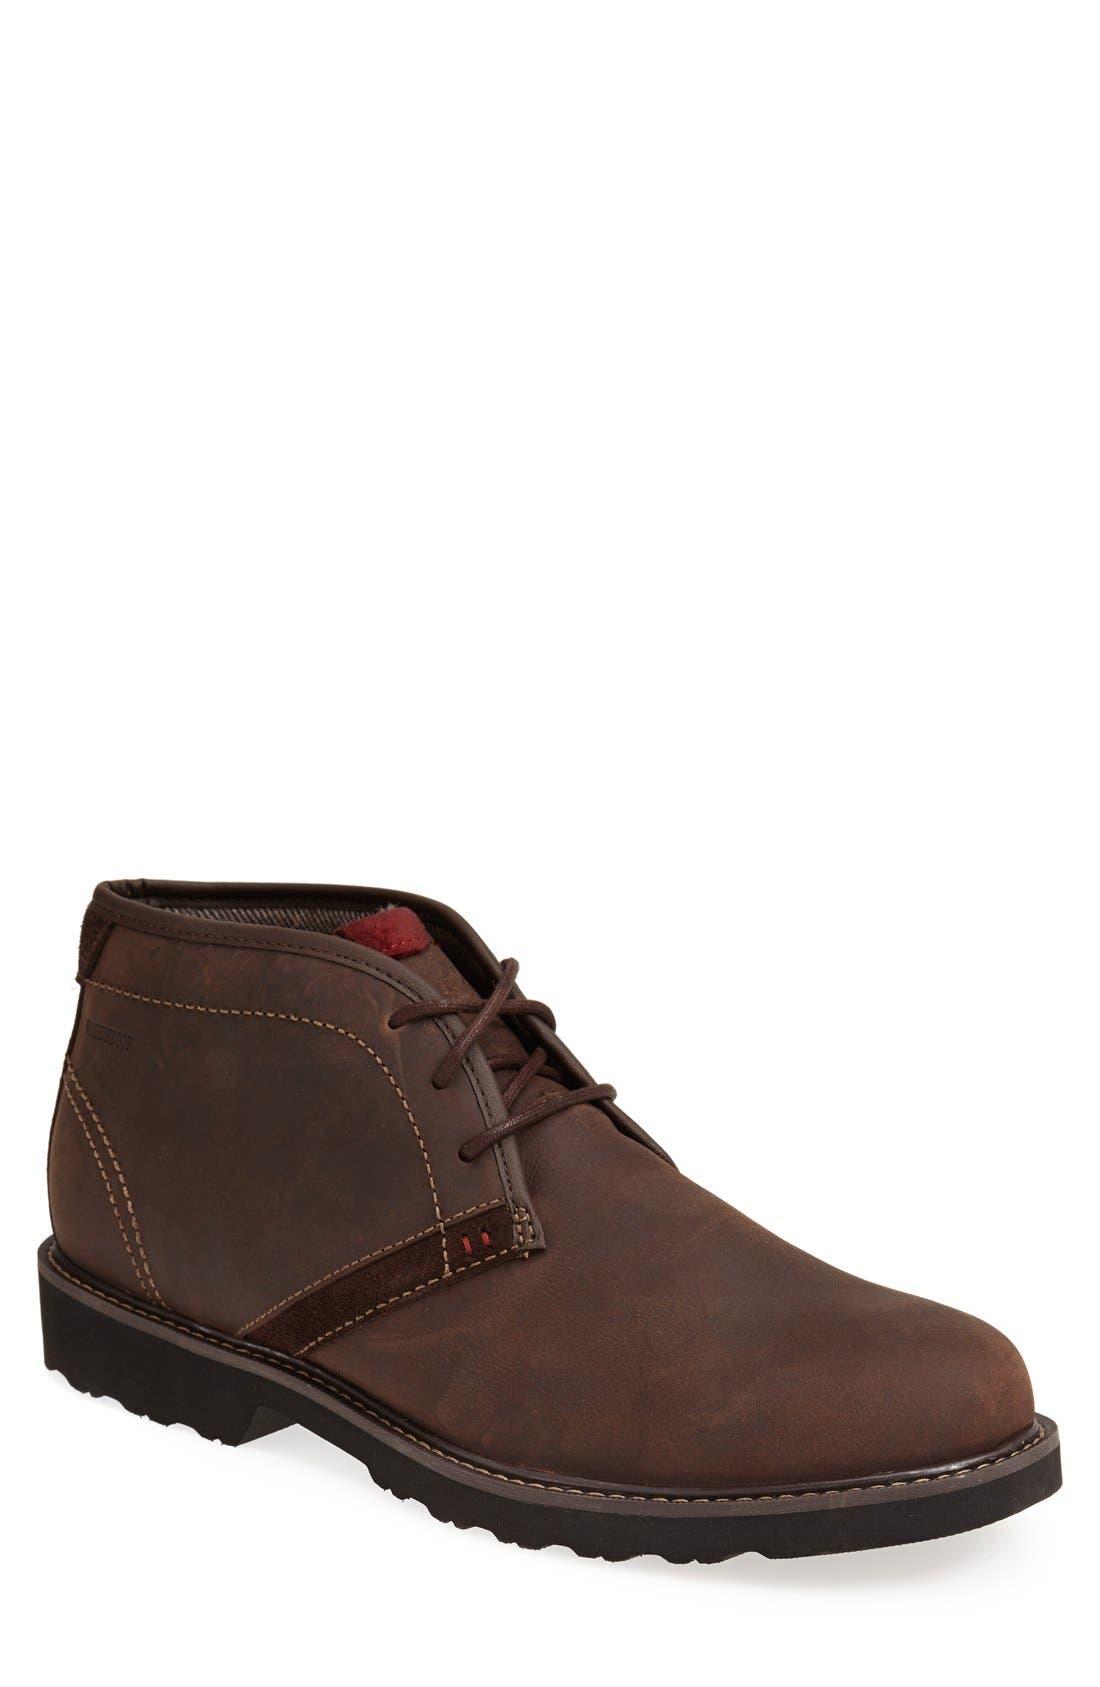 Dunham 'REVdash' Chukka Boot (Men)